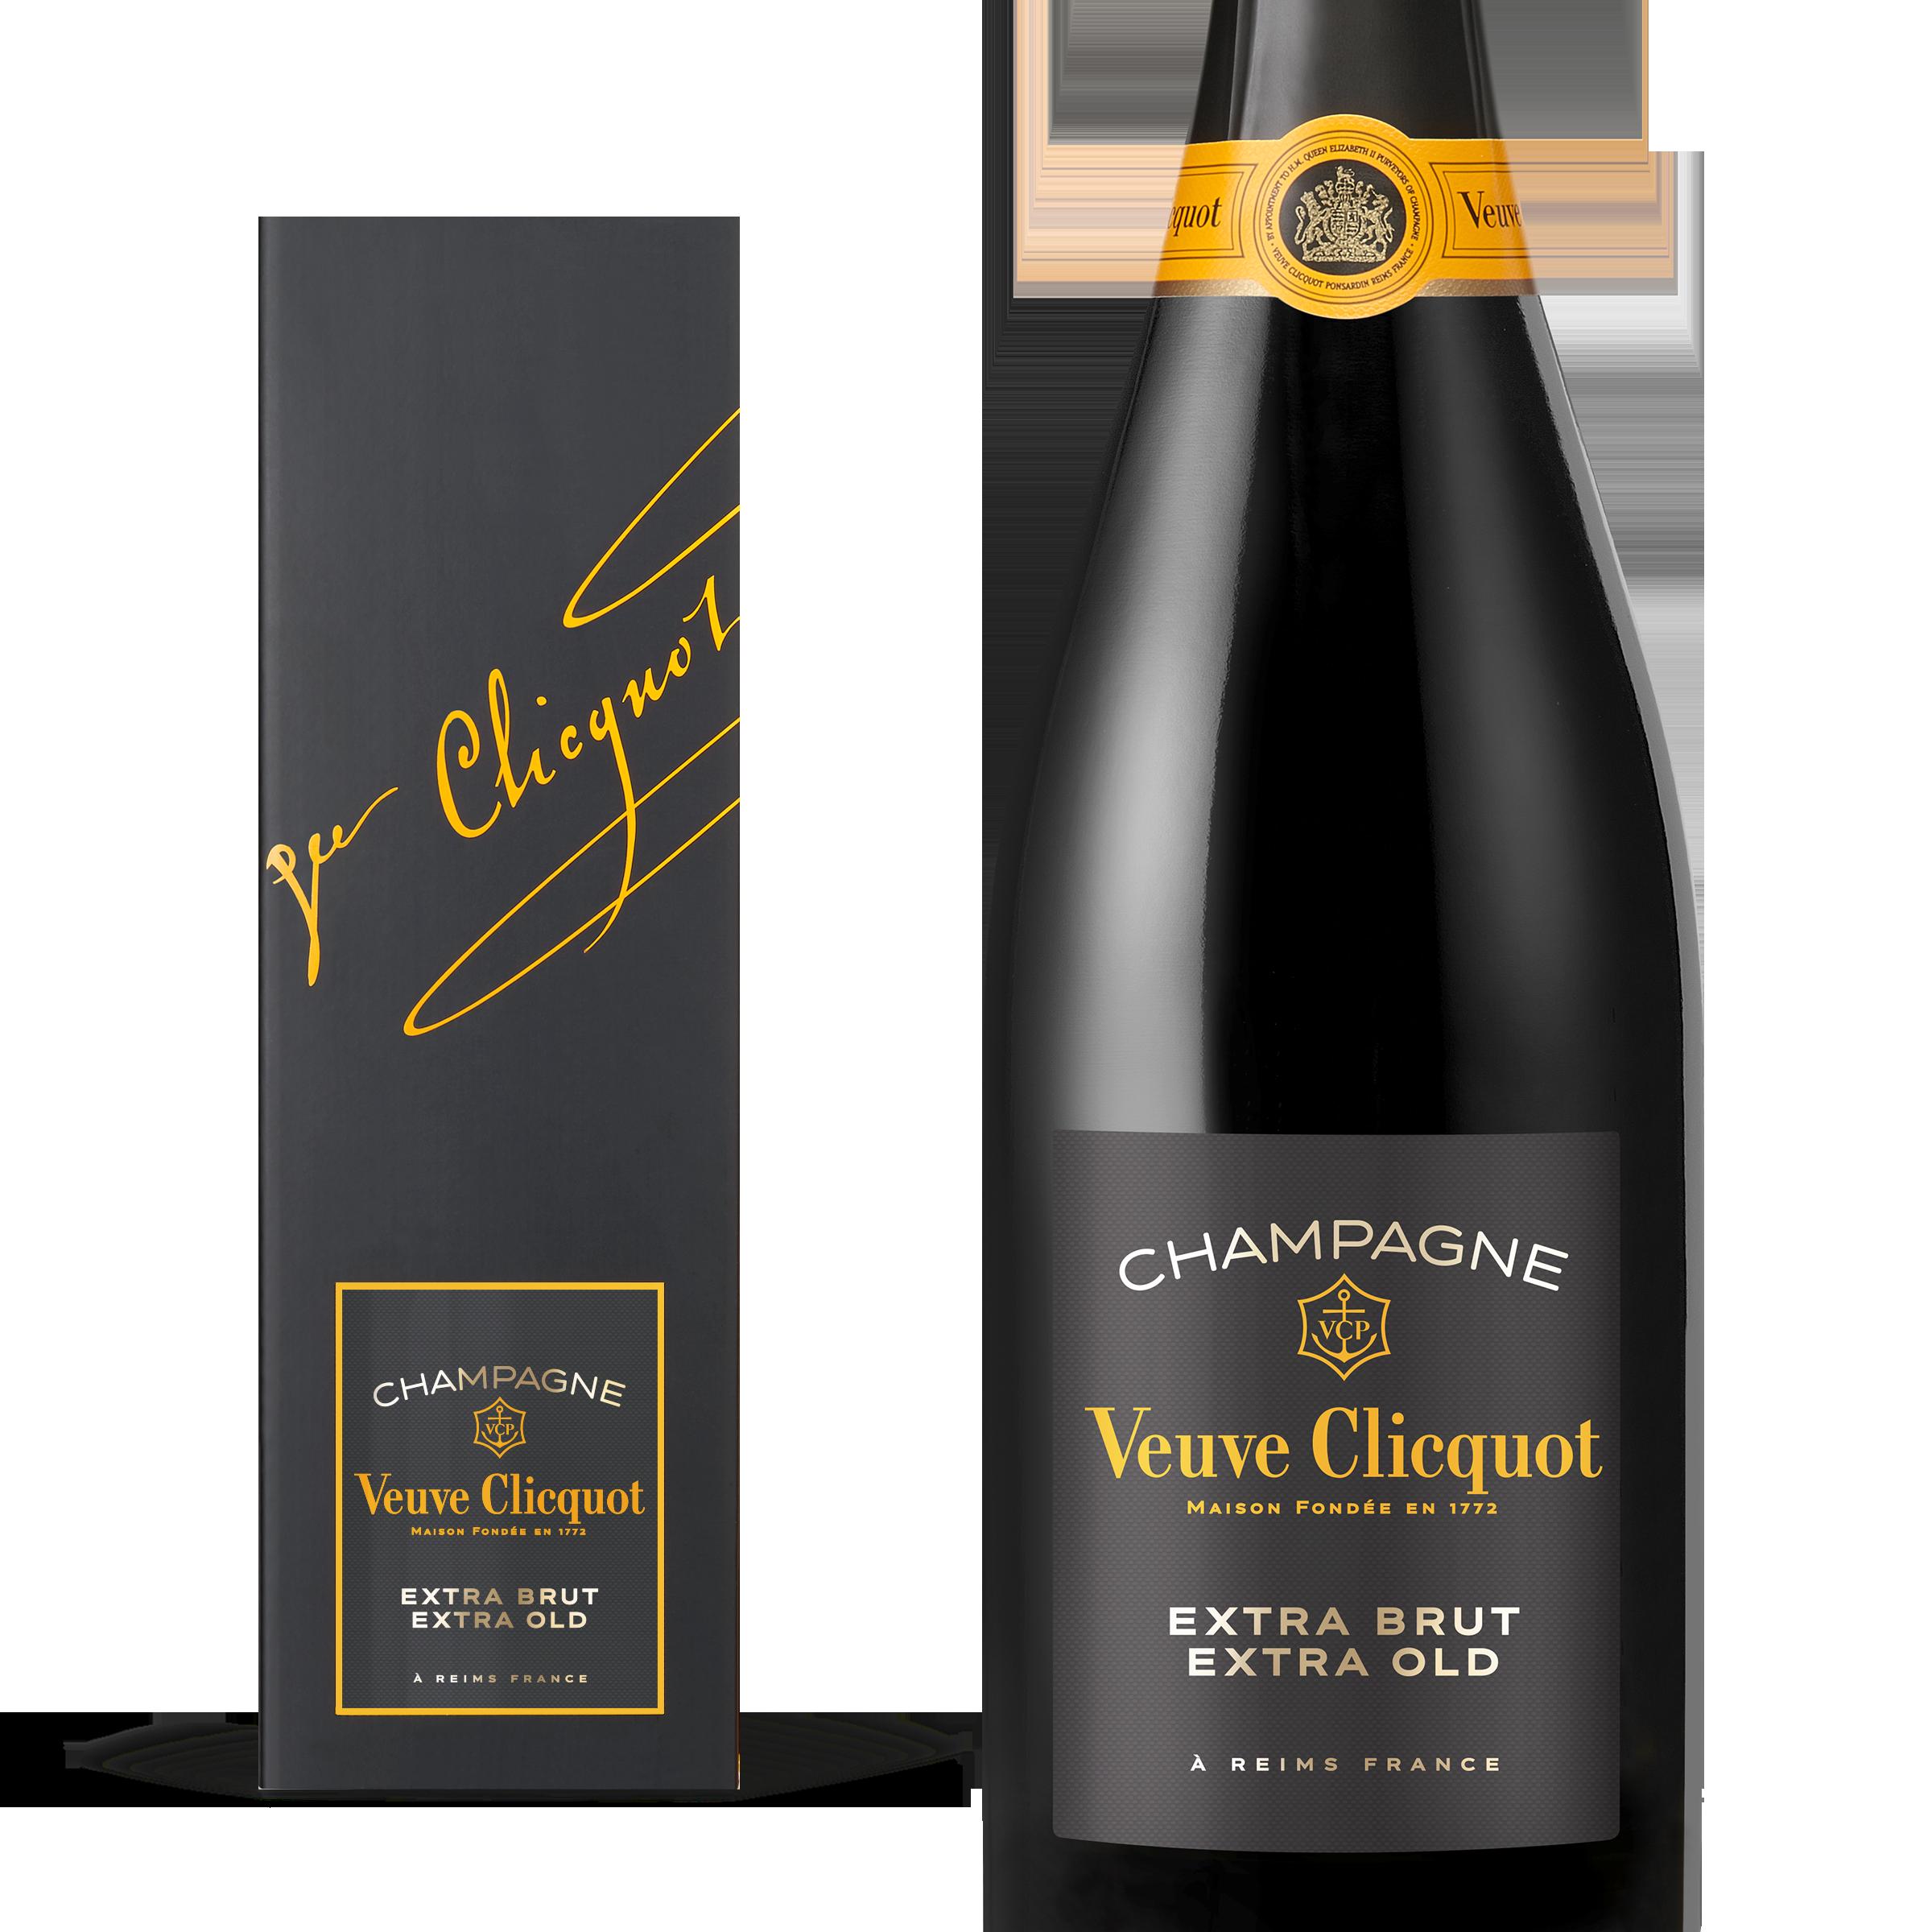 Veuve Clicquot Extra Brut Extra Old 2 75CL